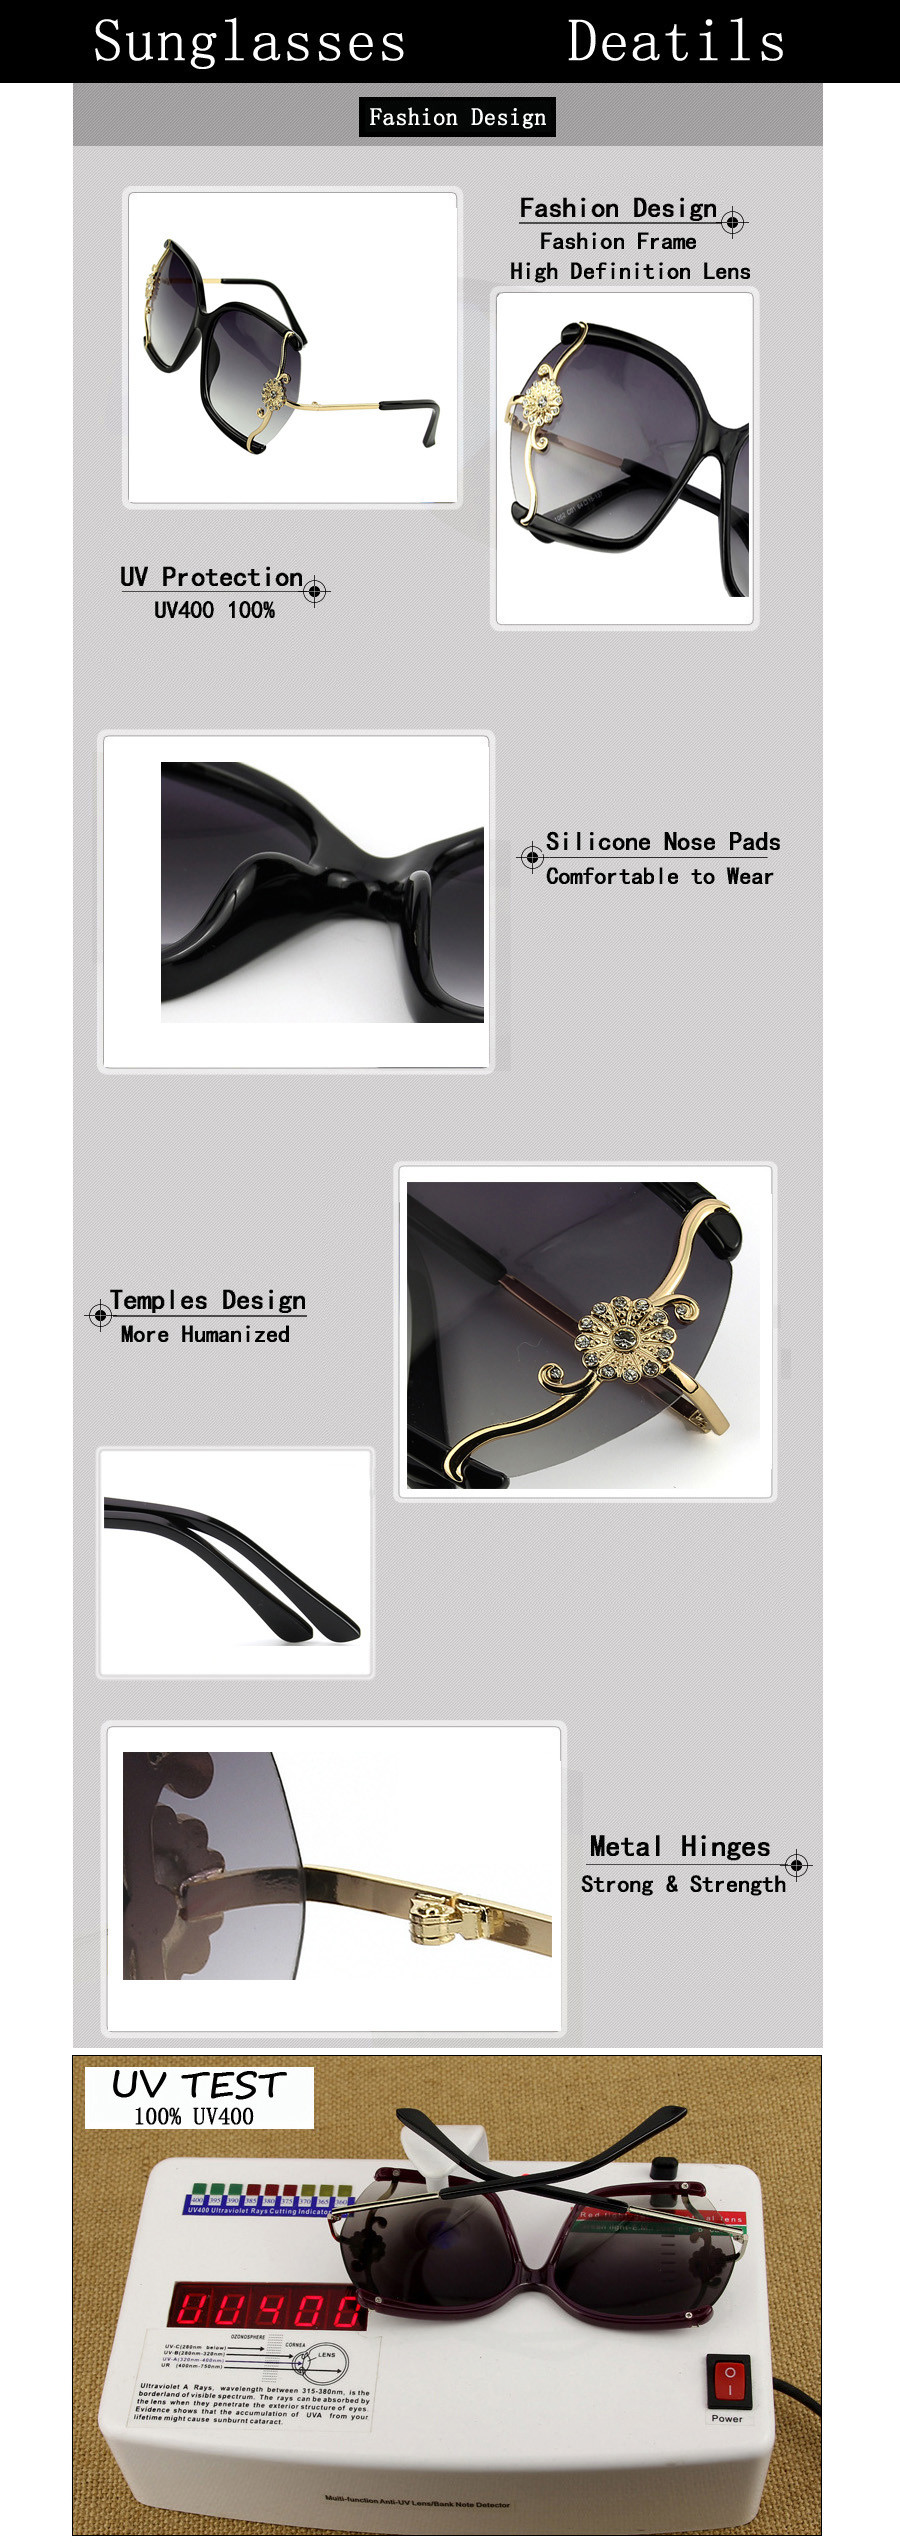 SG5898-Sunglasses Details